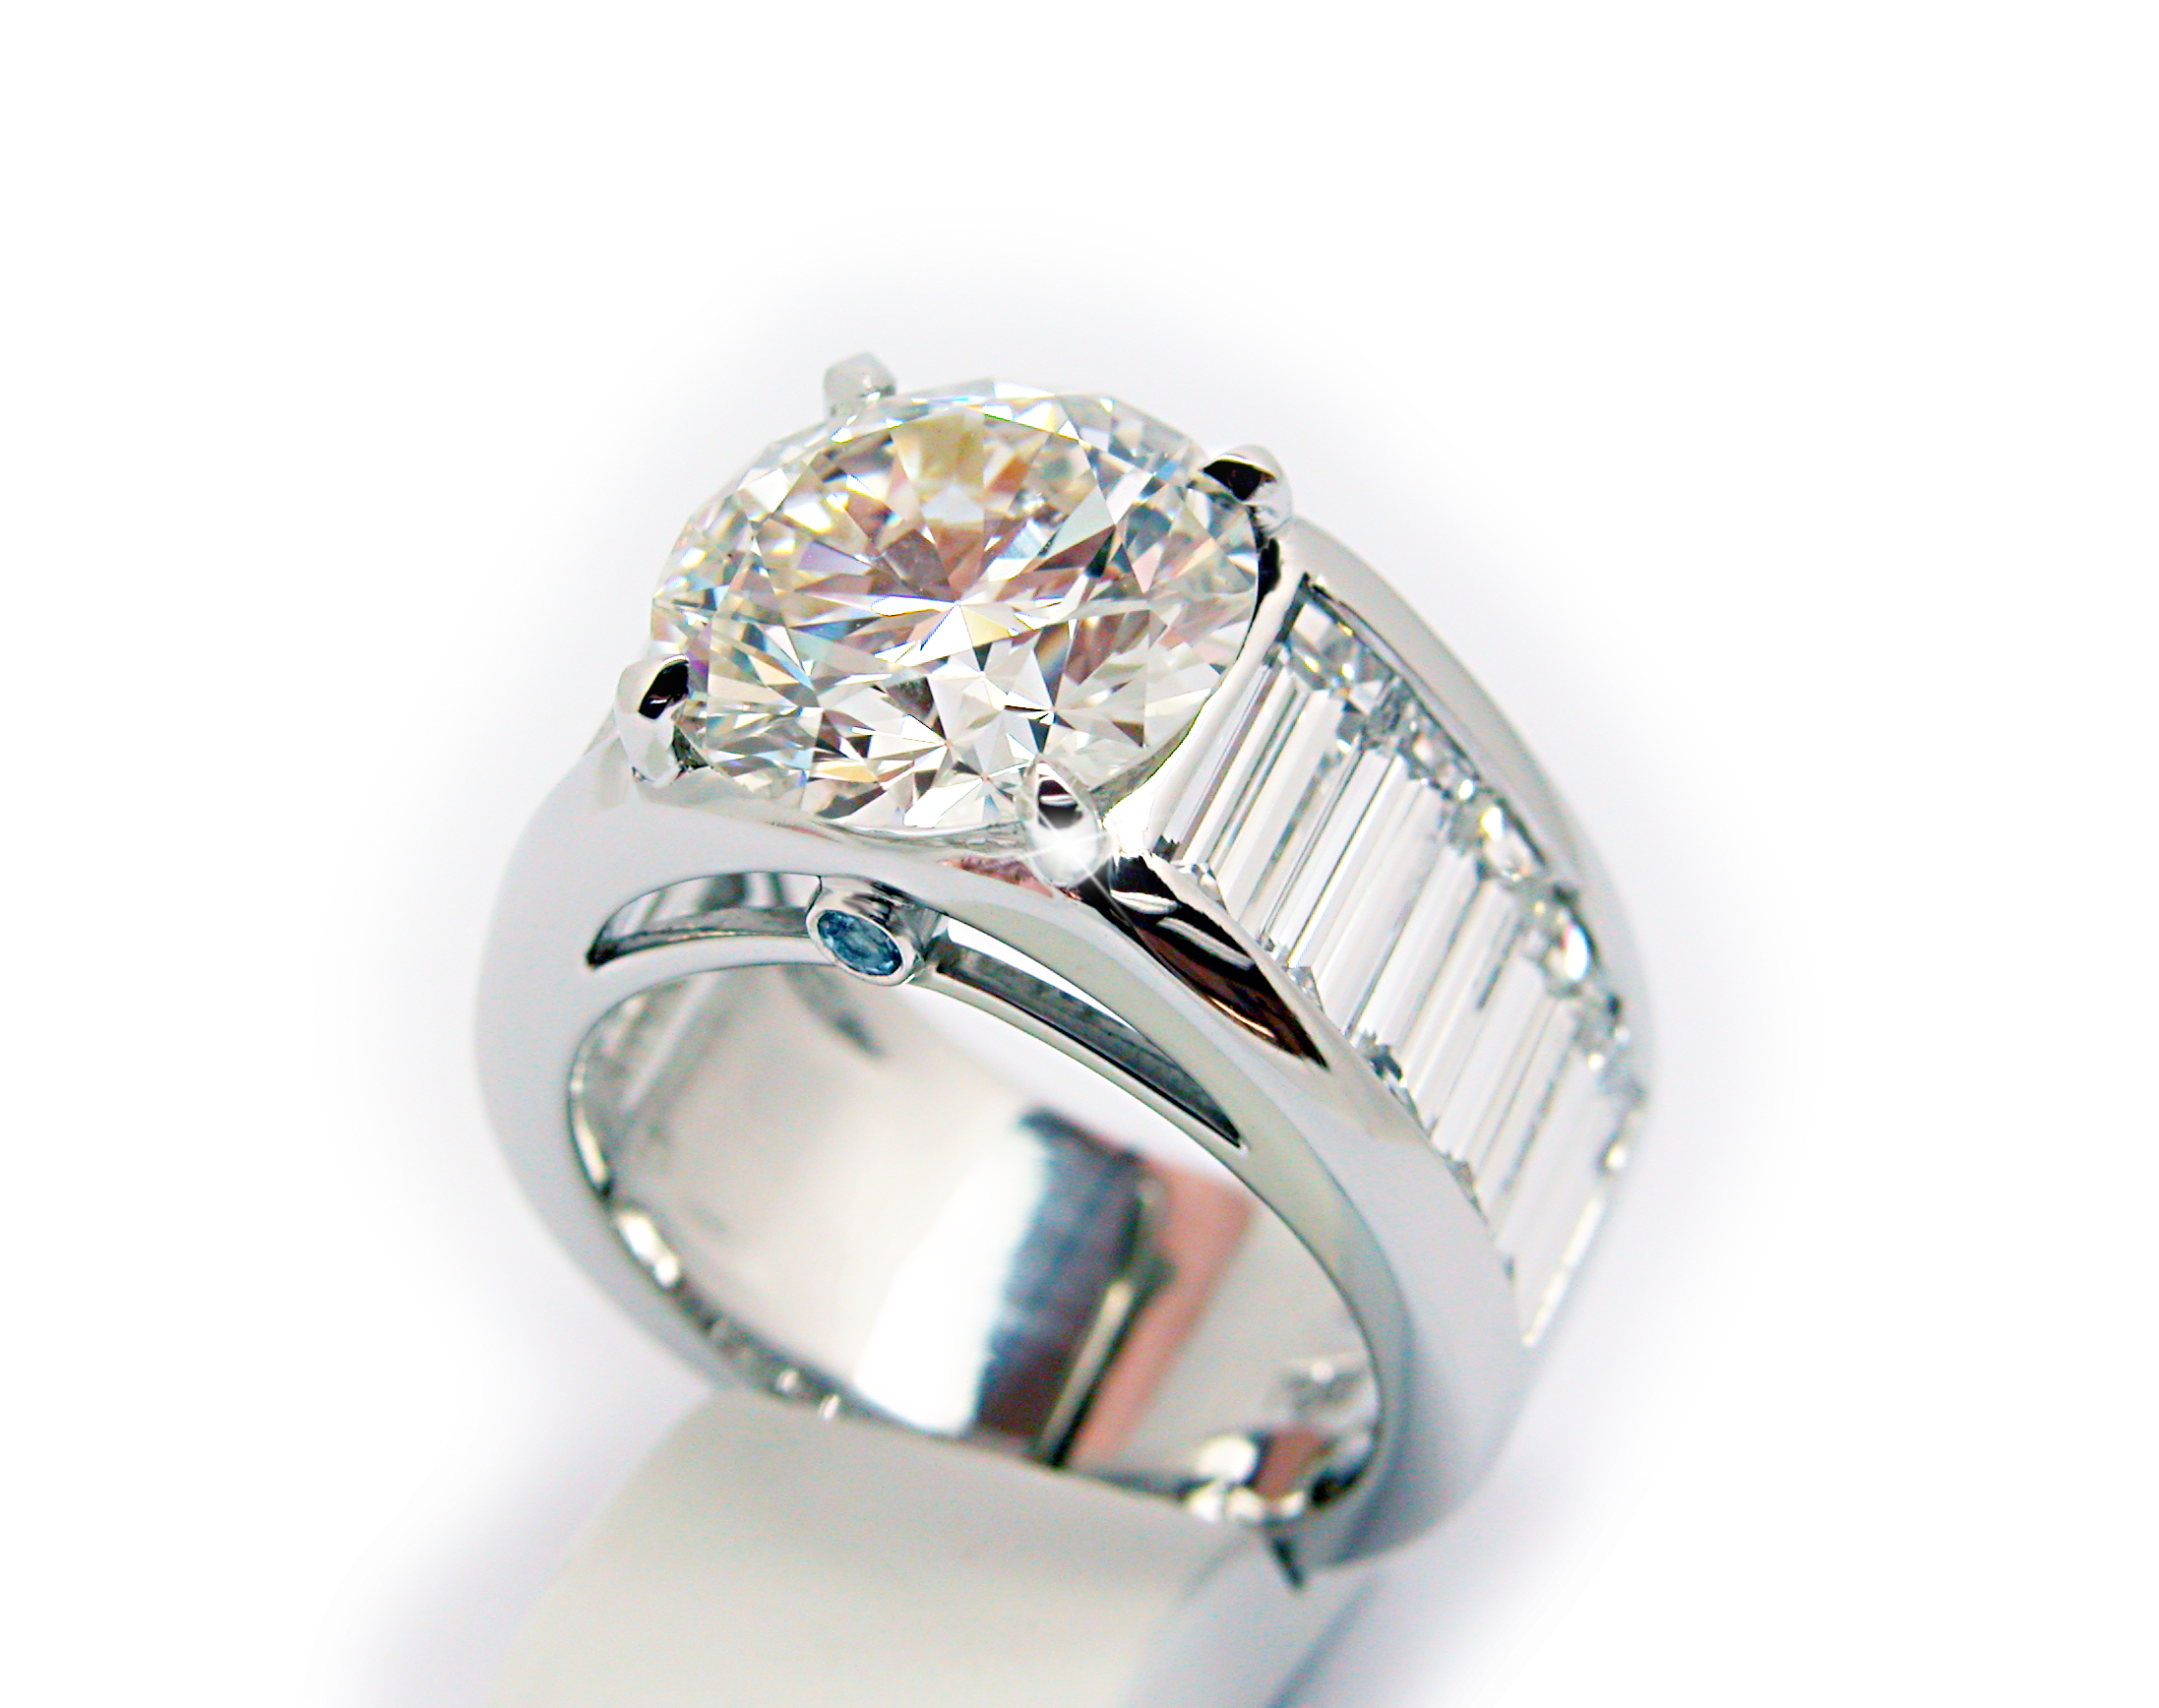 Baguette Diamond Ring Designs